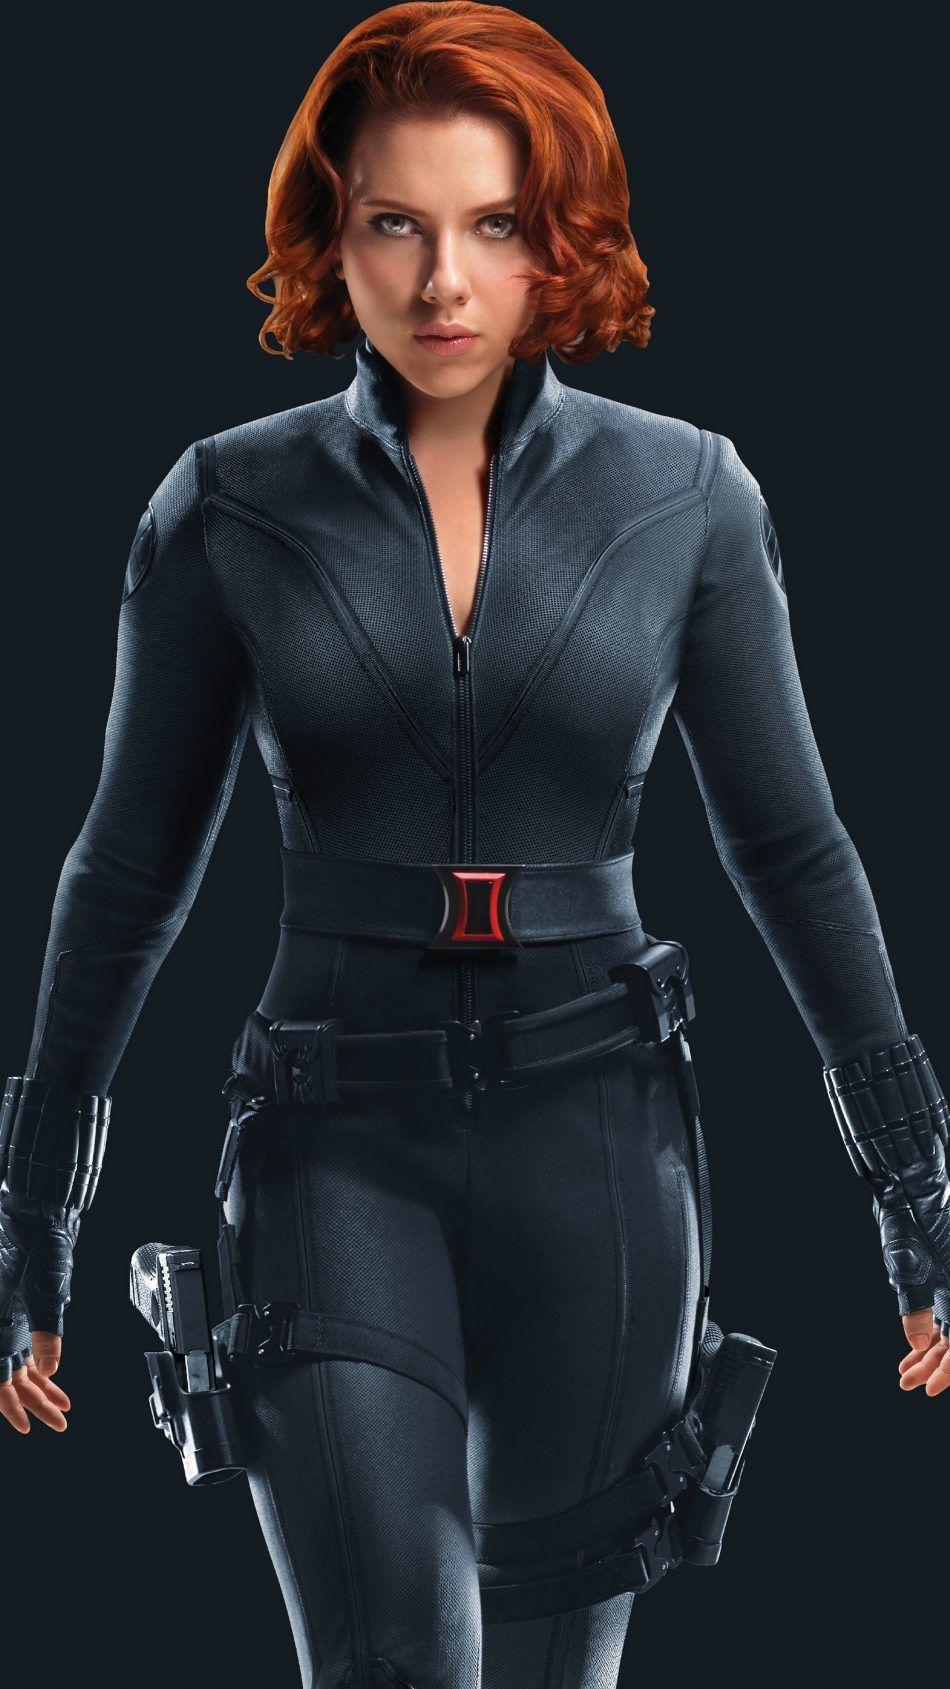 Black Widow Scarlett Johansson Superhero 4k Ultra Hd Mobile Wallpaper Black Widow Scarlett Scarlett Johansson Marvel Black Widow Marvel